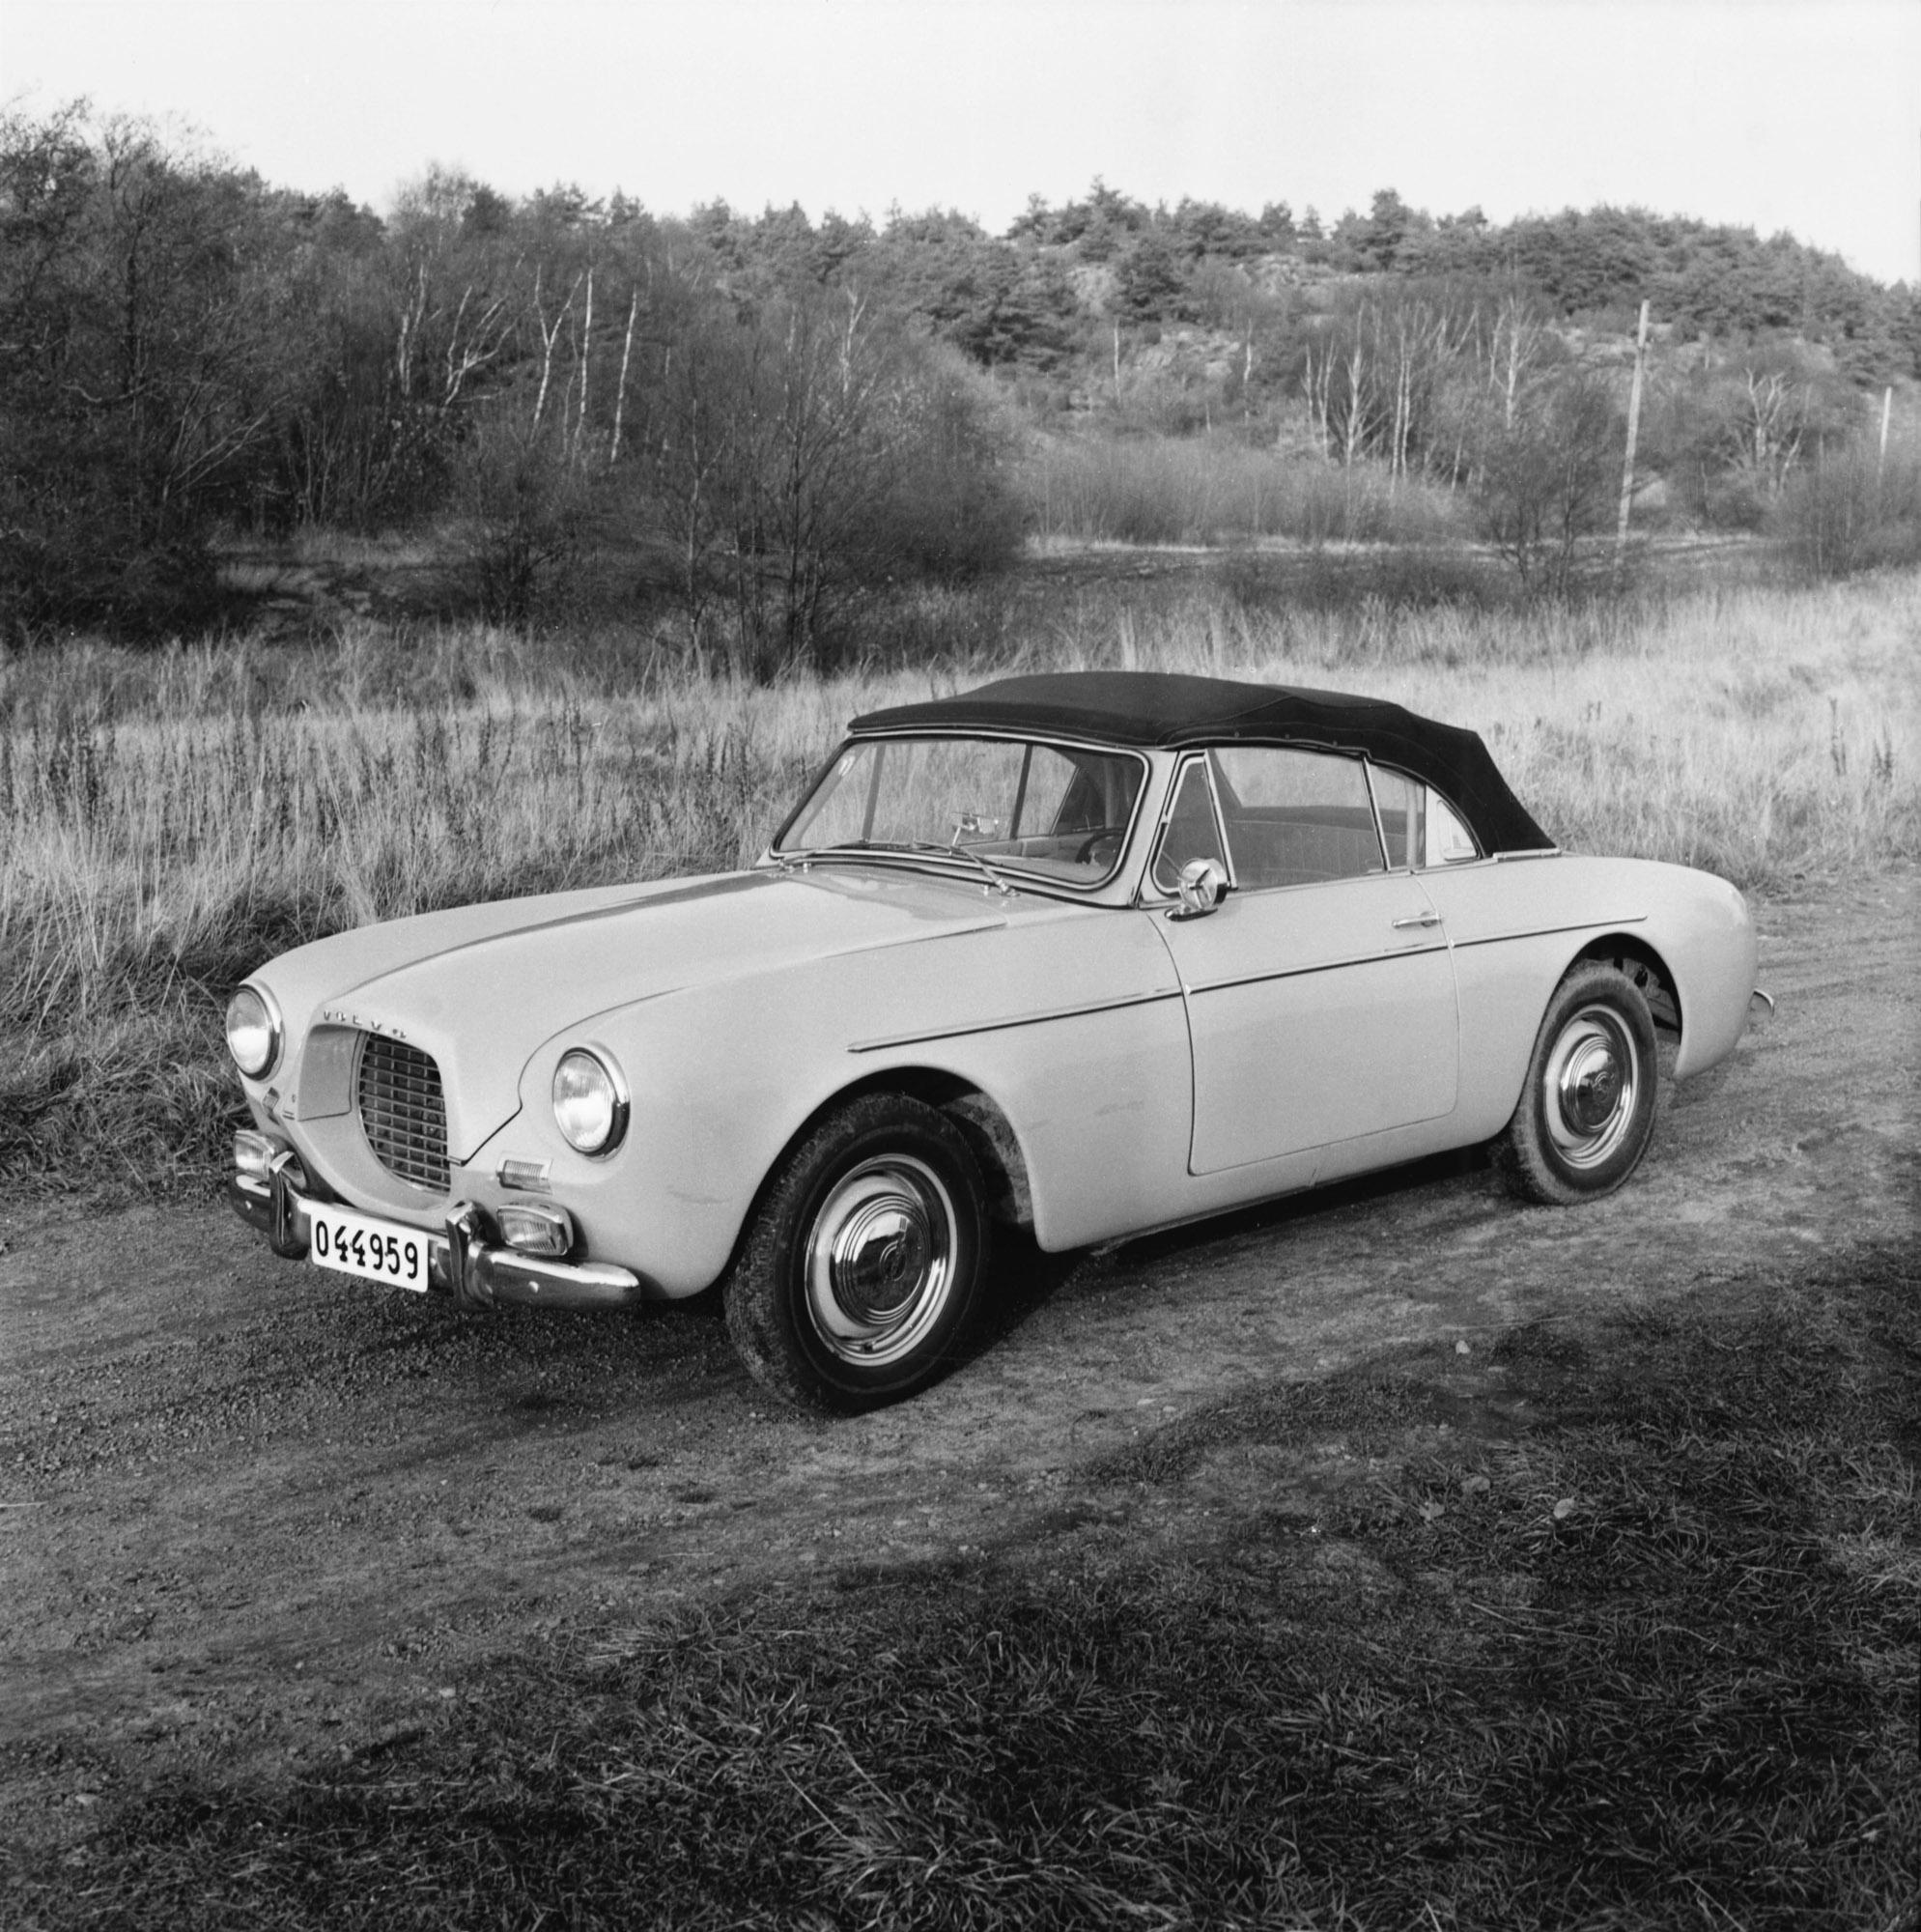 1956 Volvo Sport Convertible Thumbnail Photo 60075